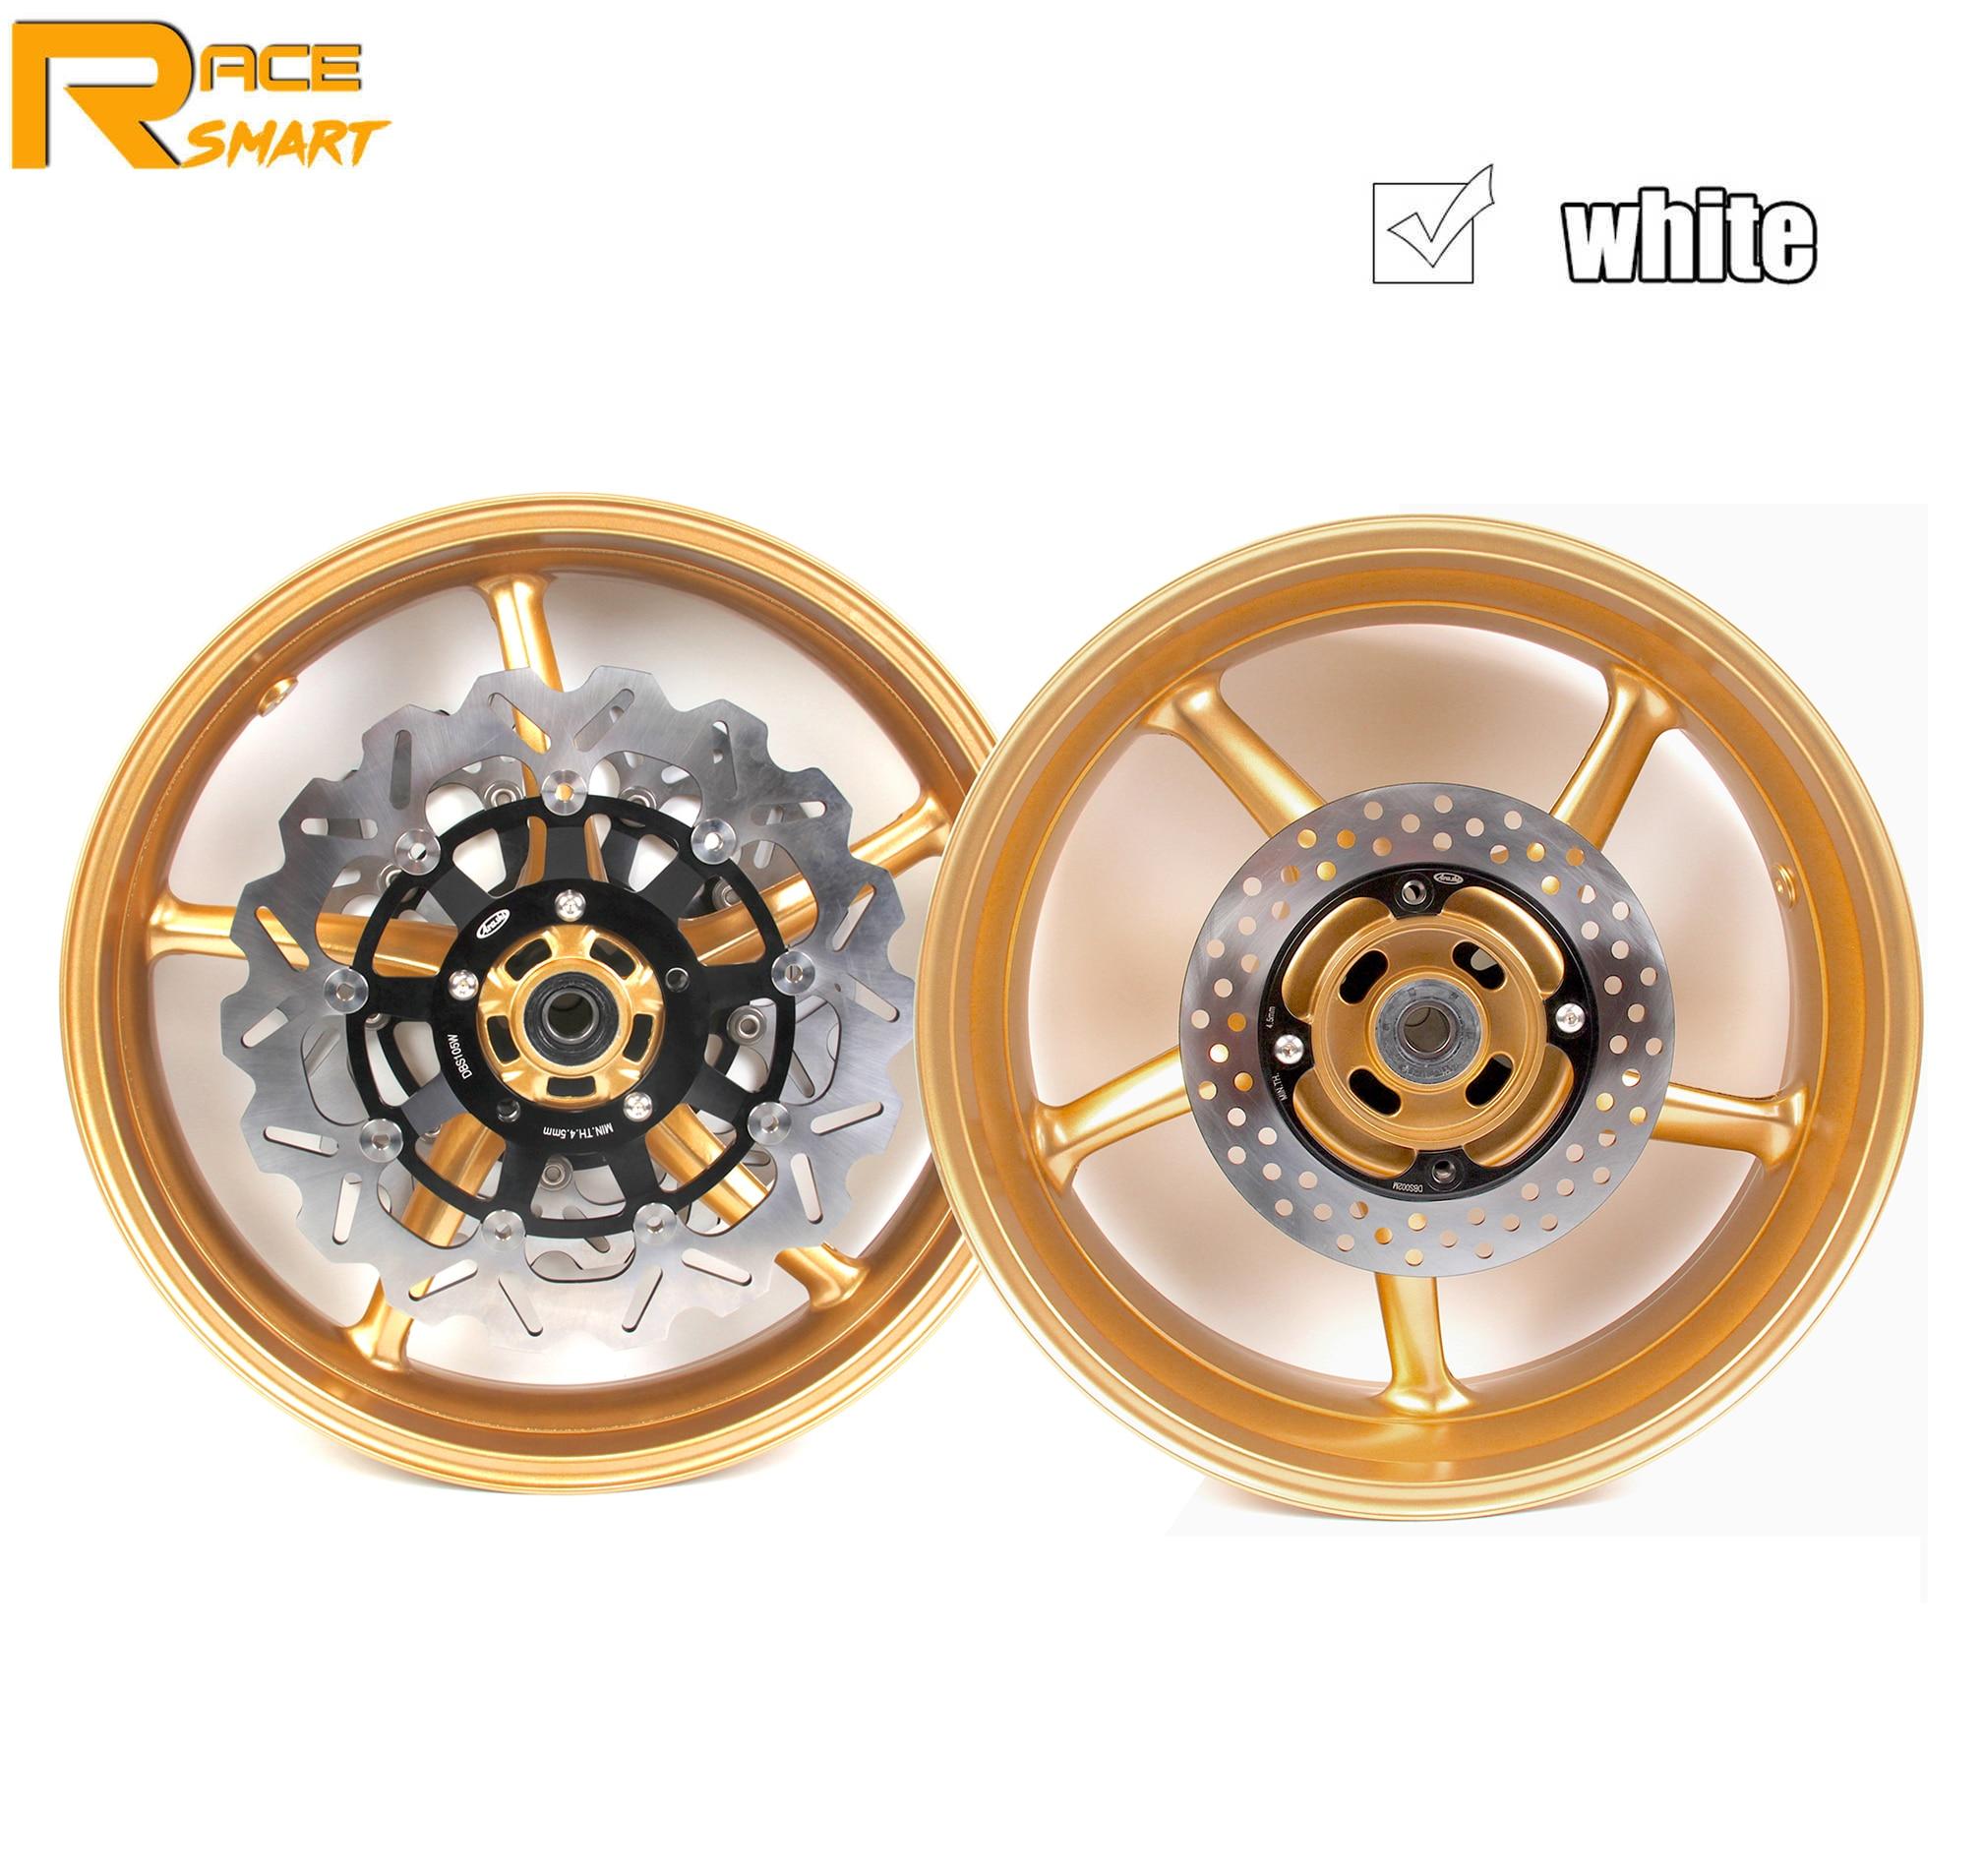 Rear Brake Disc Rotor For Triumph Street Triple 675 2007-2012 675R 2011 2012